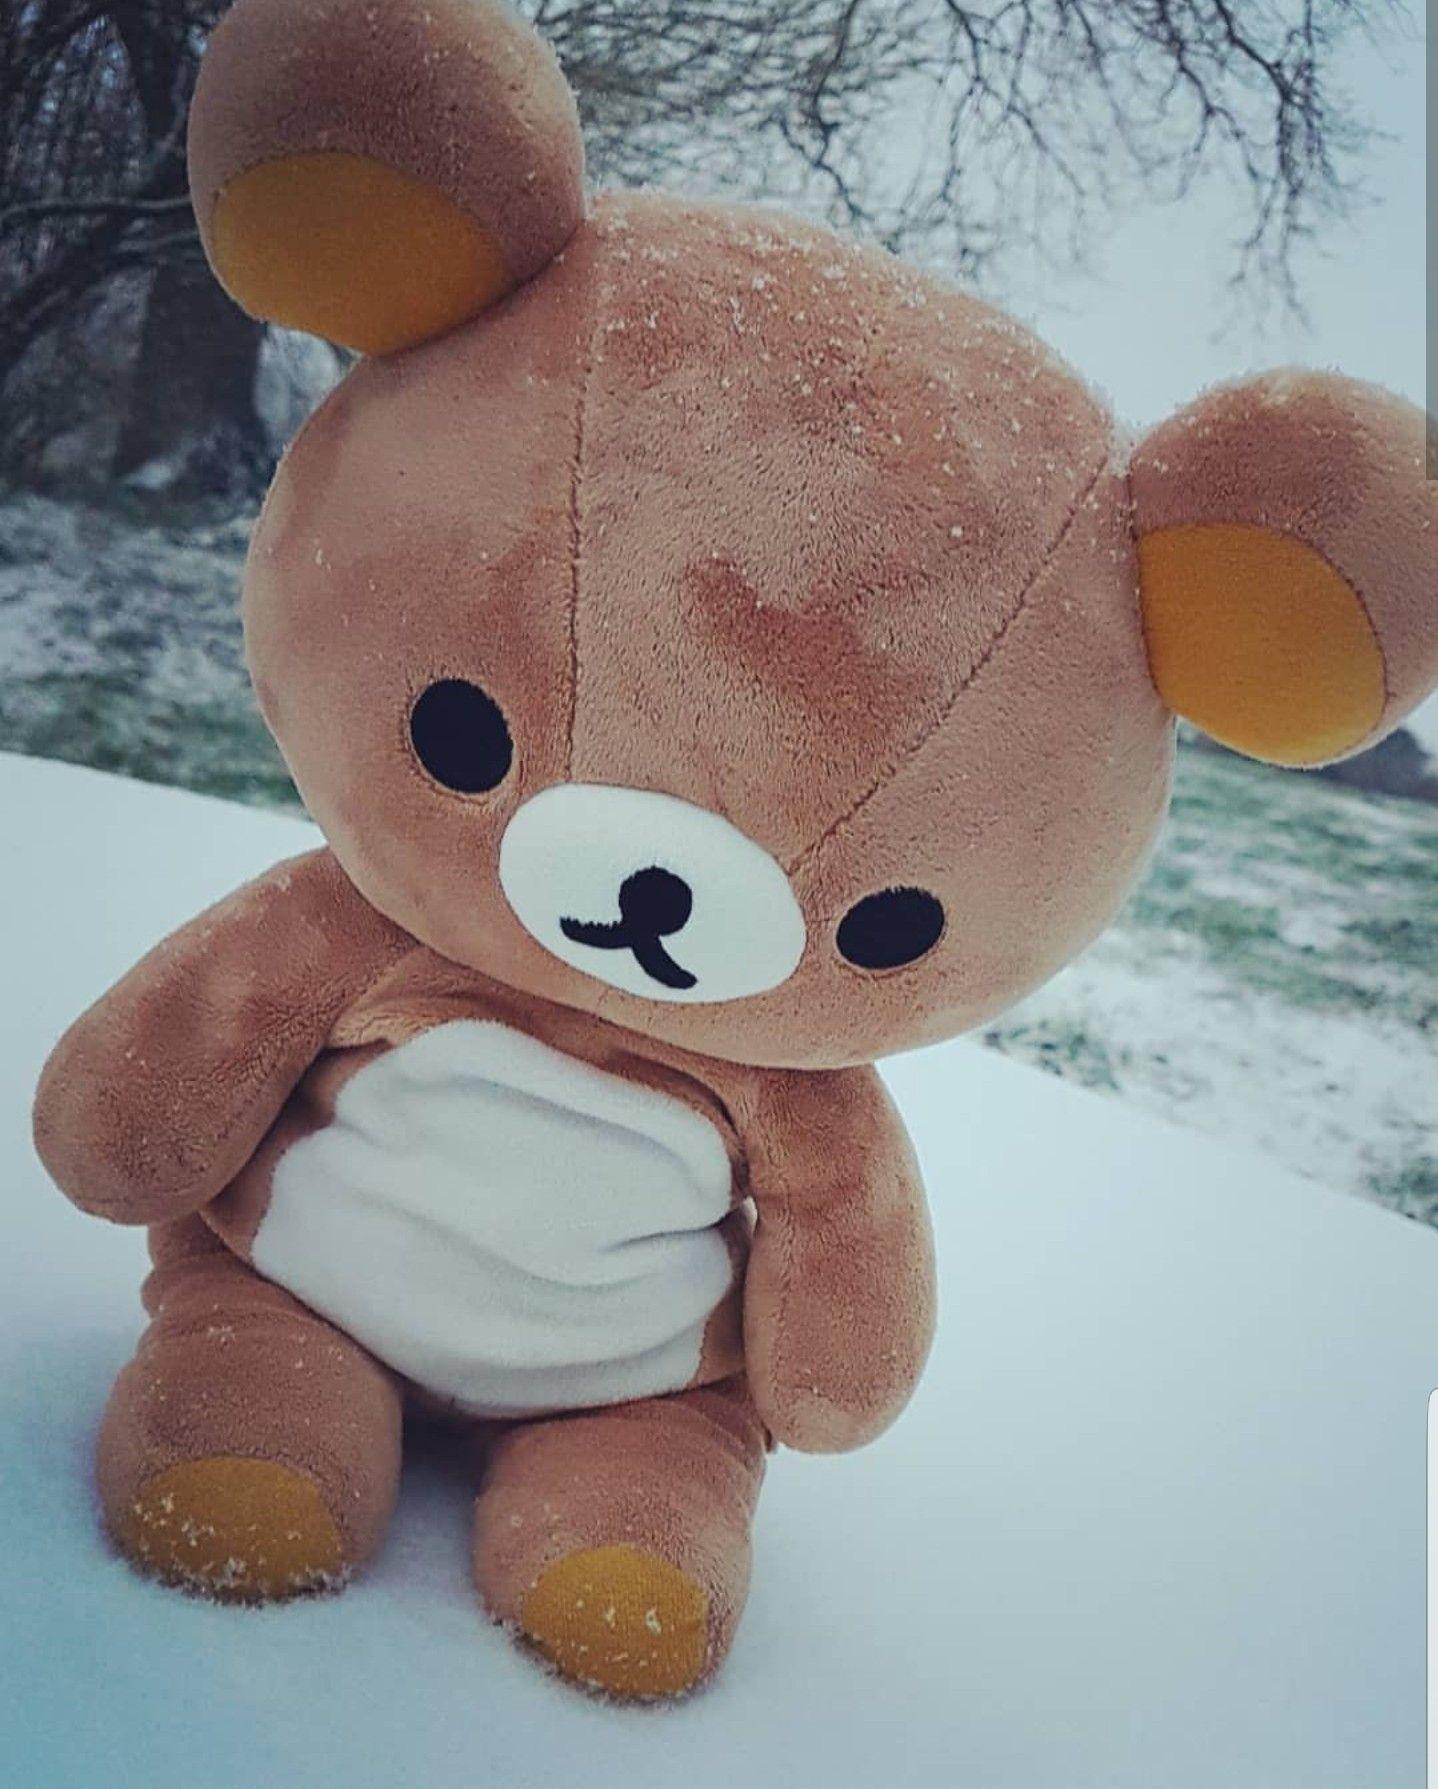 Snow Kuma (With images) Cute stuffed animals